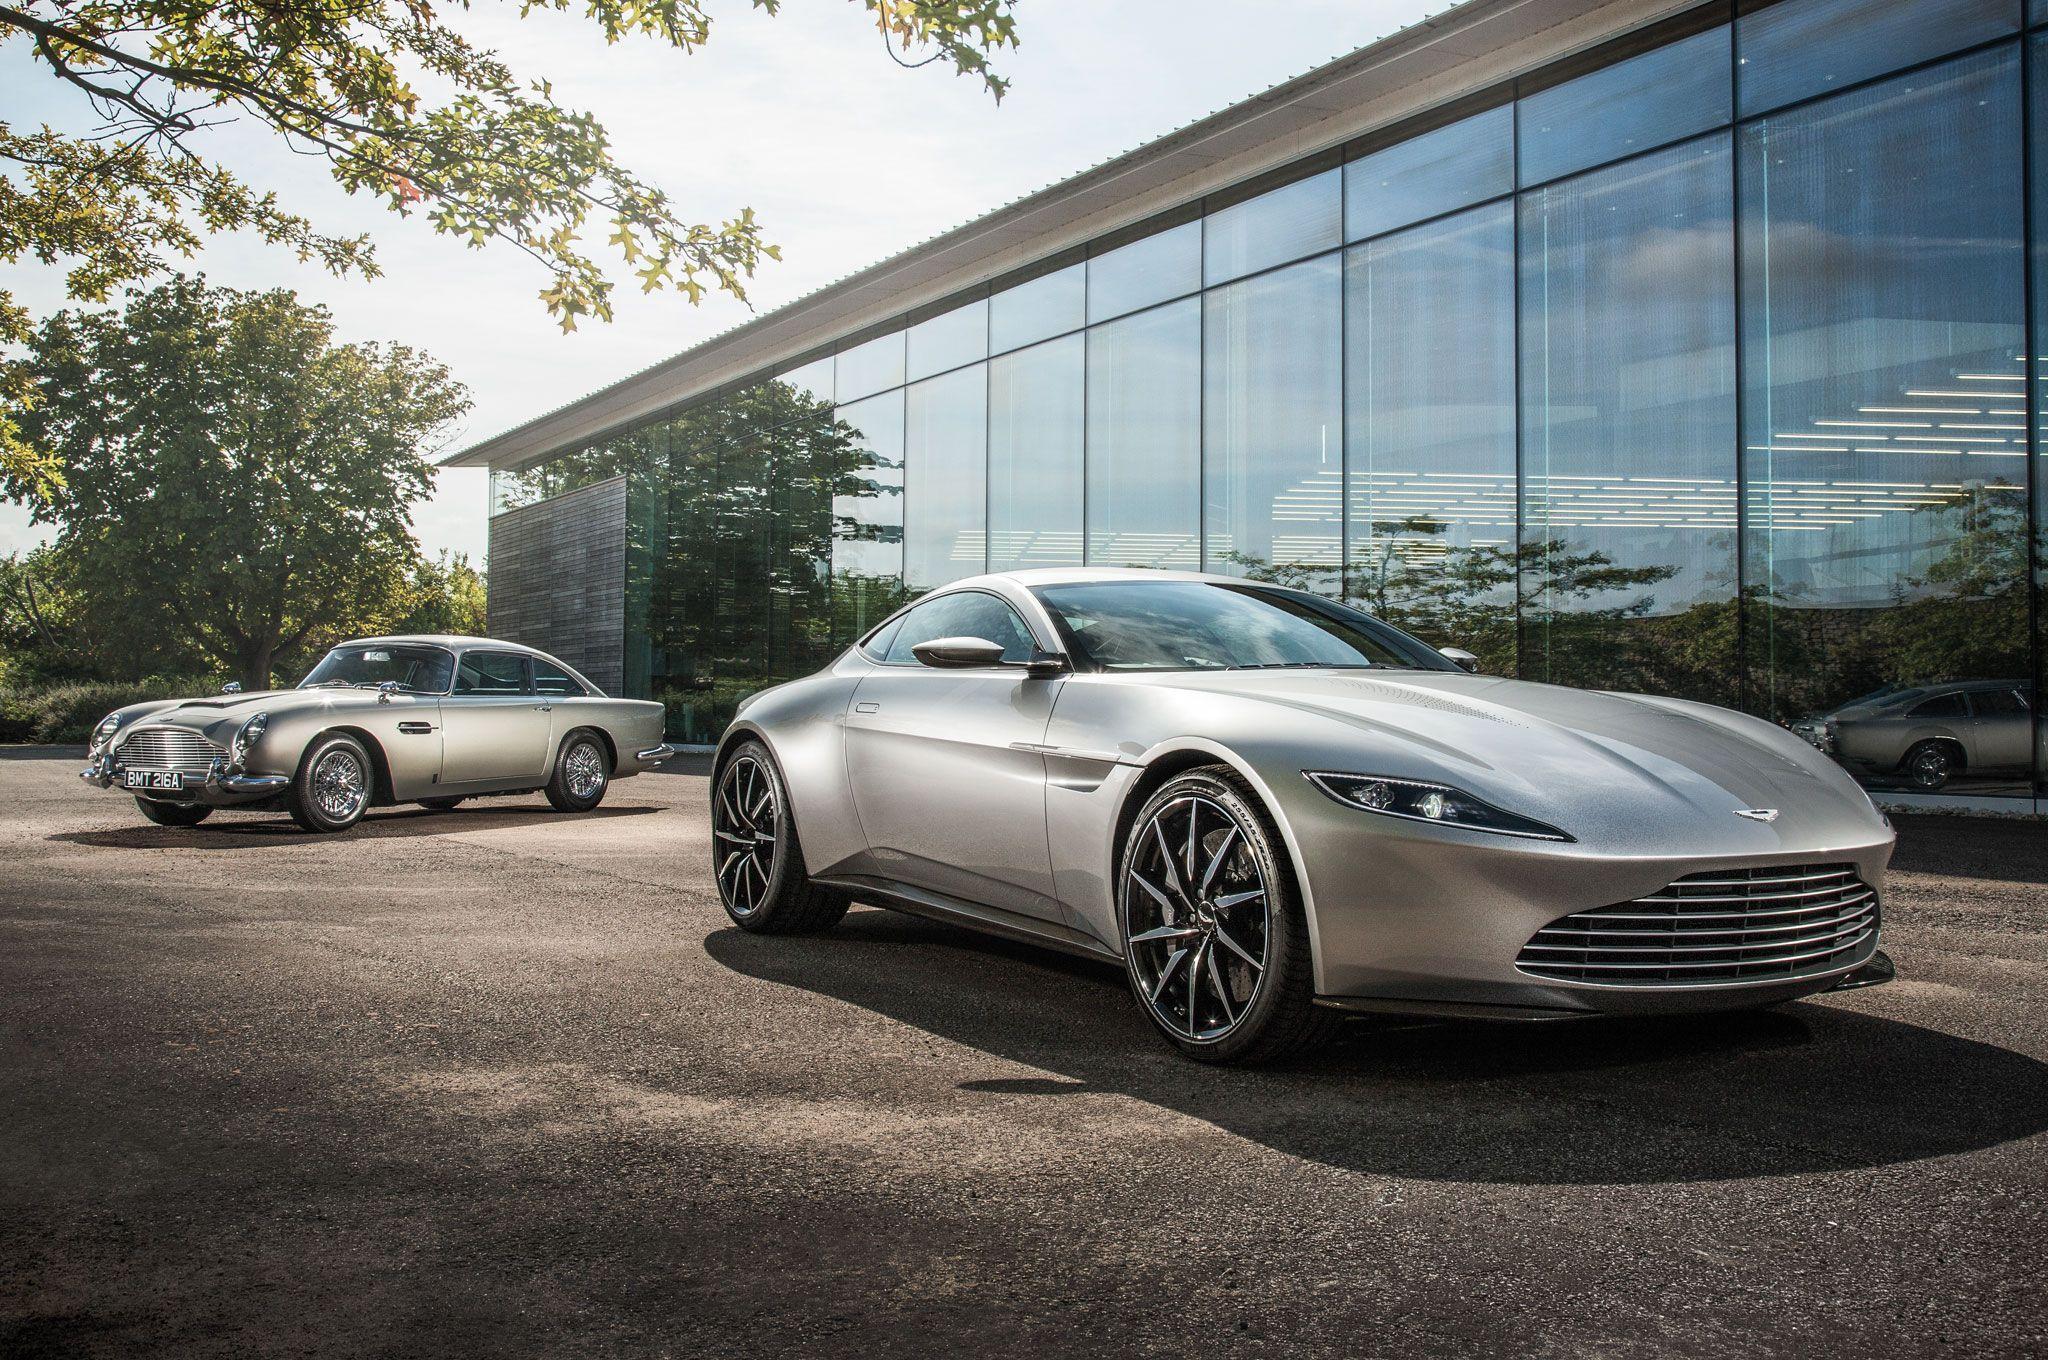 Aston Martin DB11 Wallpapers - Wallpaper Cave